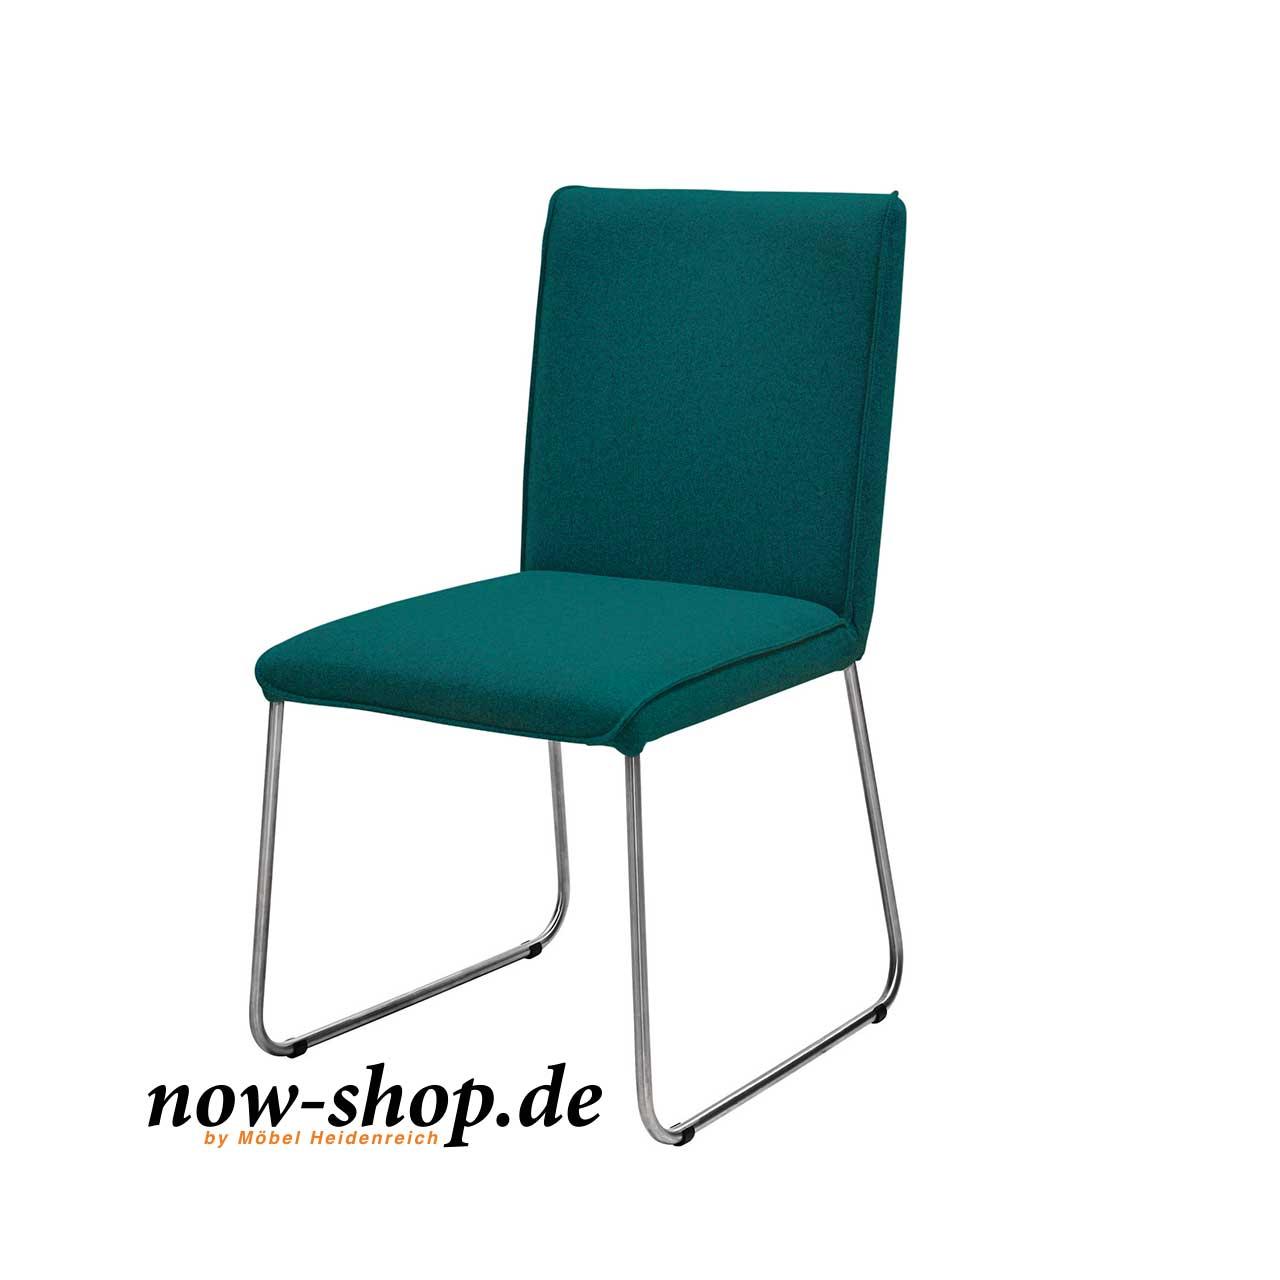 now by huelsta stuhl s21 1 now shop. Black Bedroom Furniture Sets. Home Design Ideas